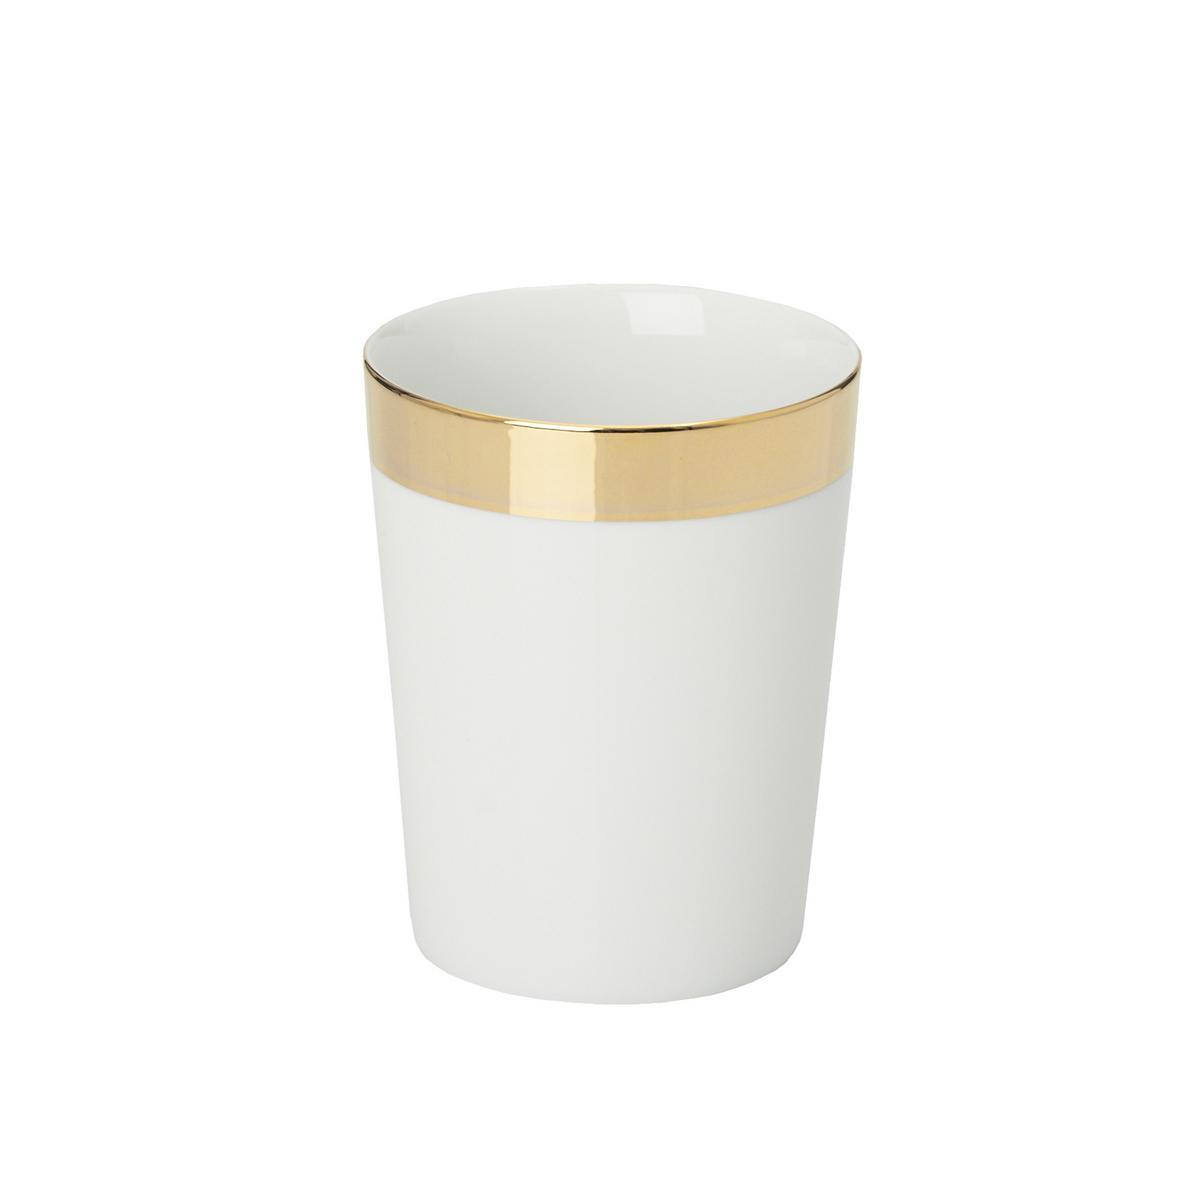 Decor walther porcelain bathroom tumbler gold for Bathroom tumbler